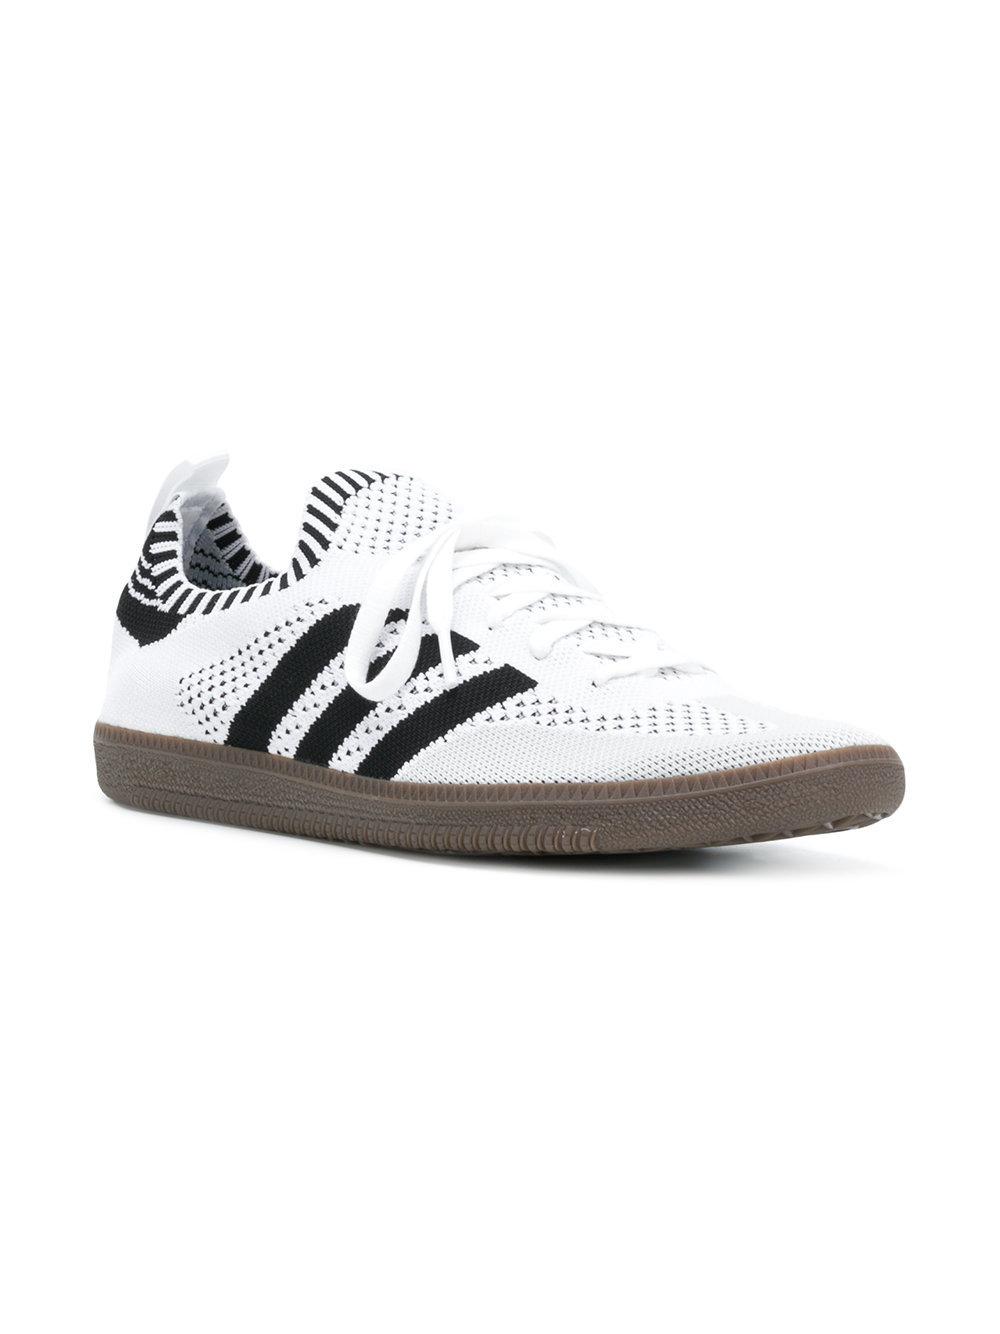 adidas Samba Sock Primeknit Sneakers